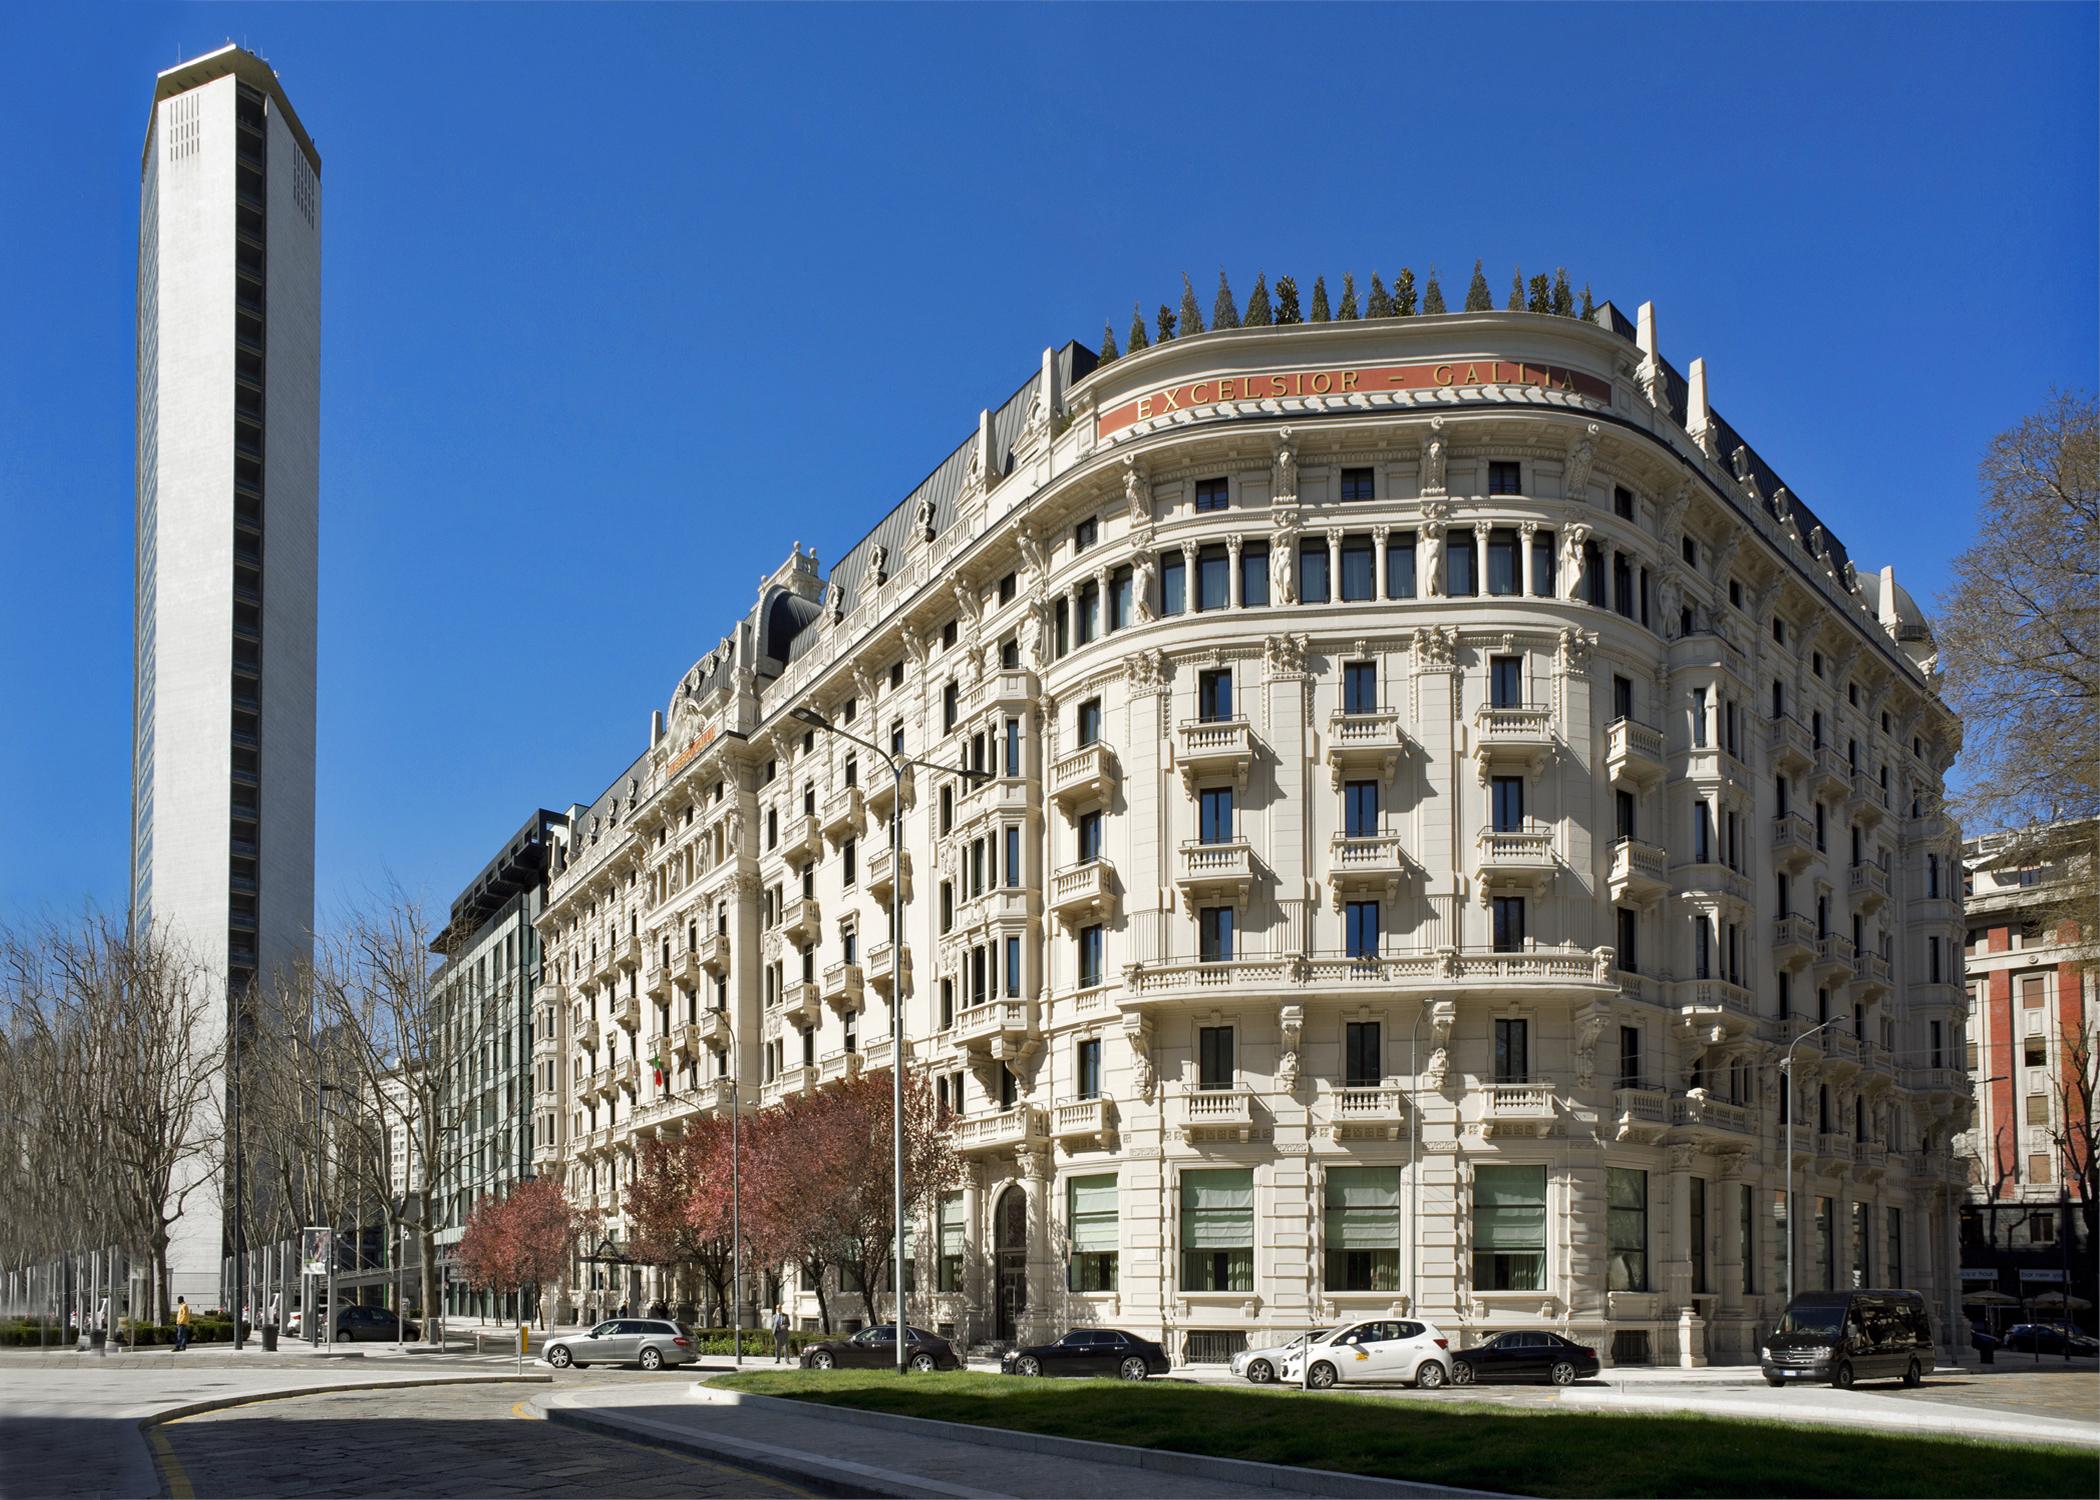 Hotel Gallia recovers its elegance.